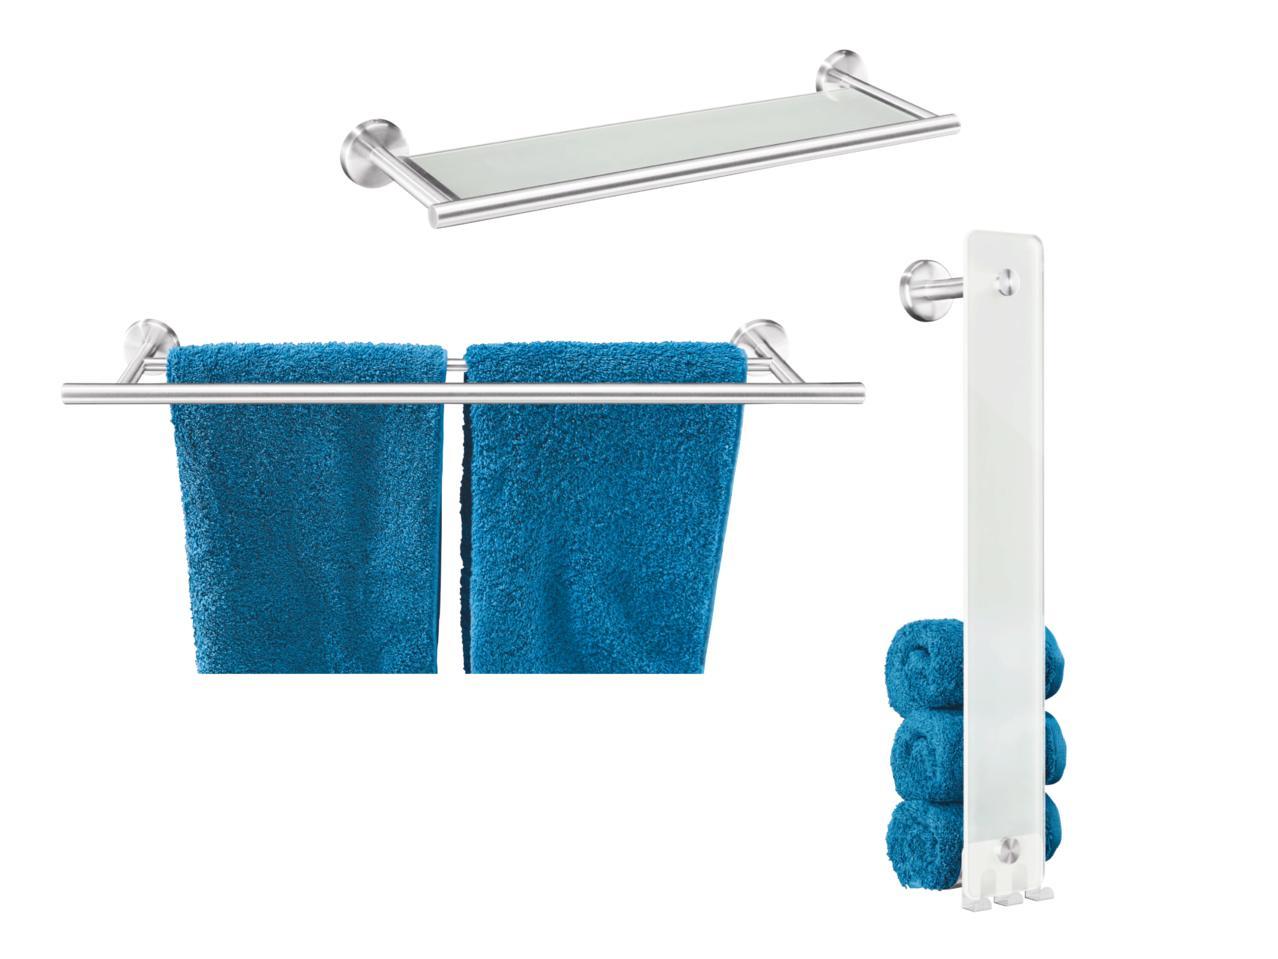 MIOMARE Towel Rail/Towel Holder/Glass Shelf - Lidl — Ireland ...